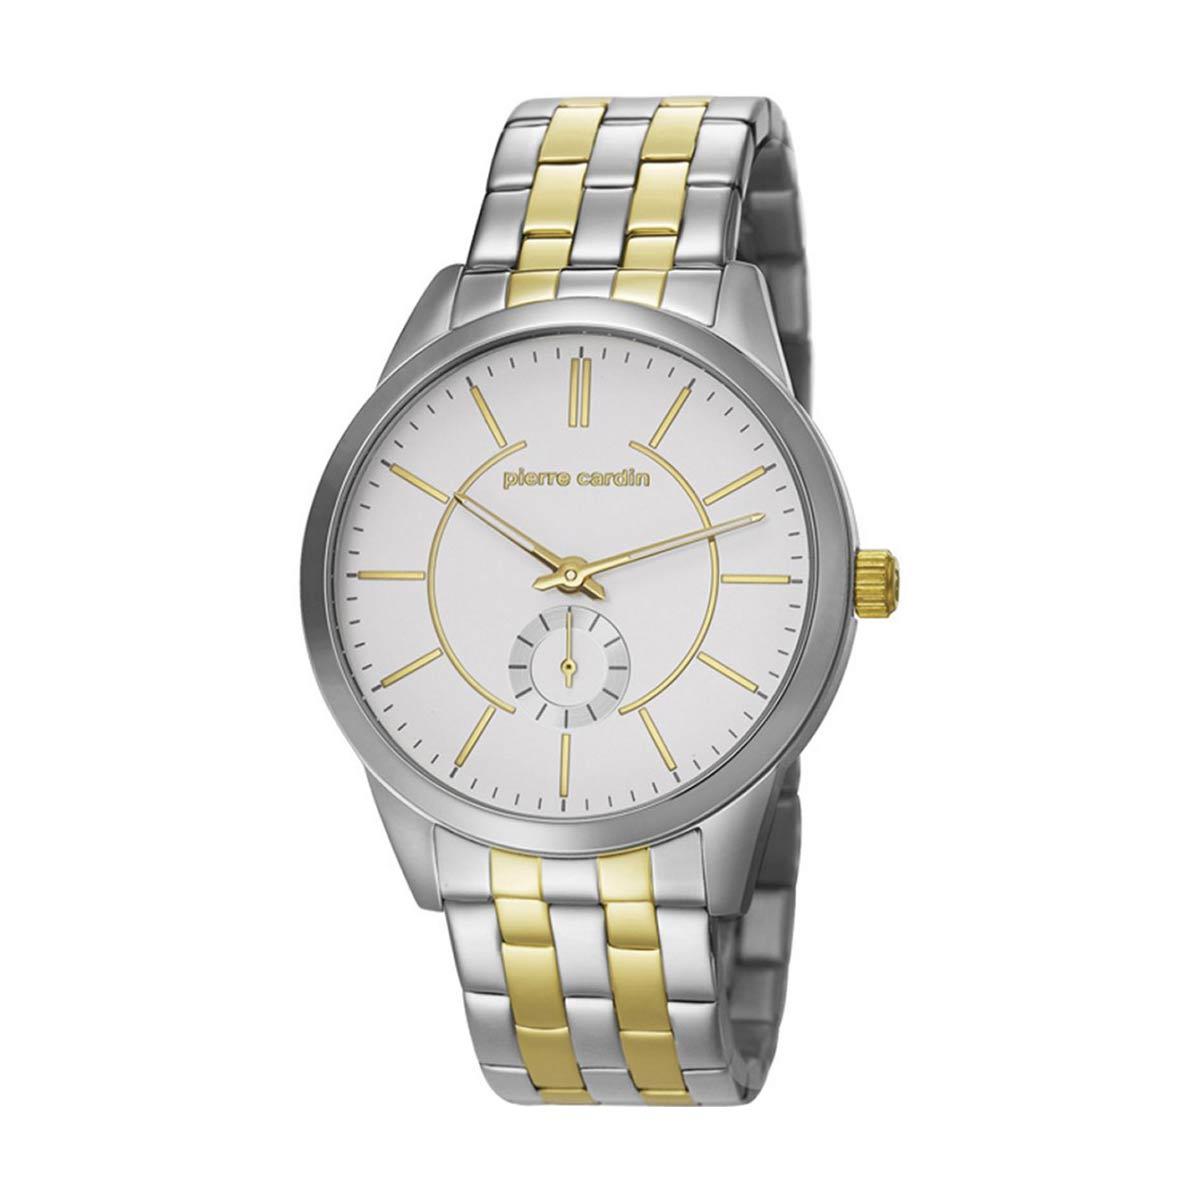 Часовник Pierre Cardin PC106571F08